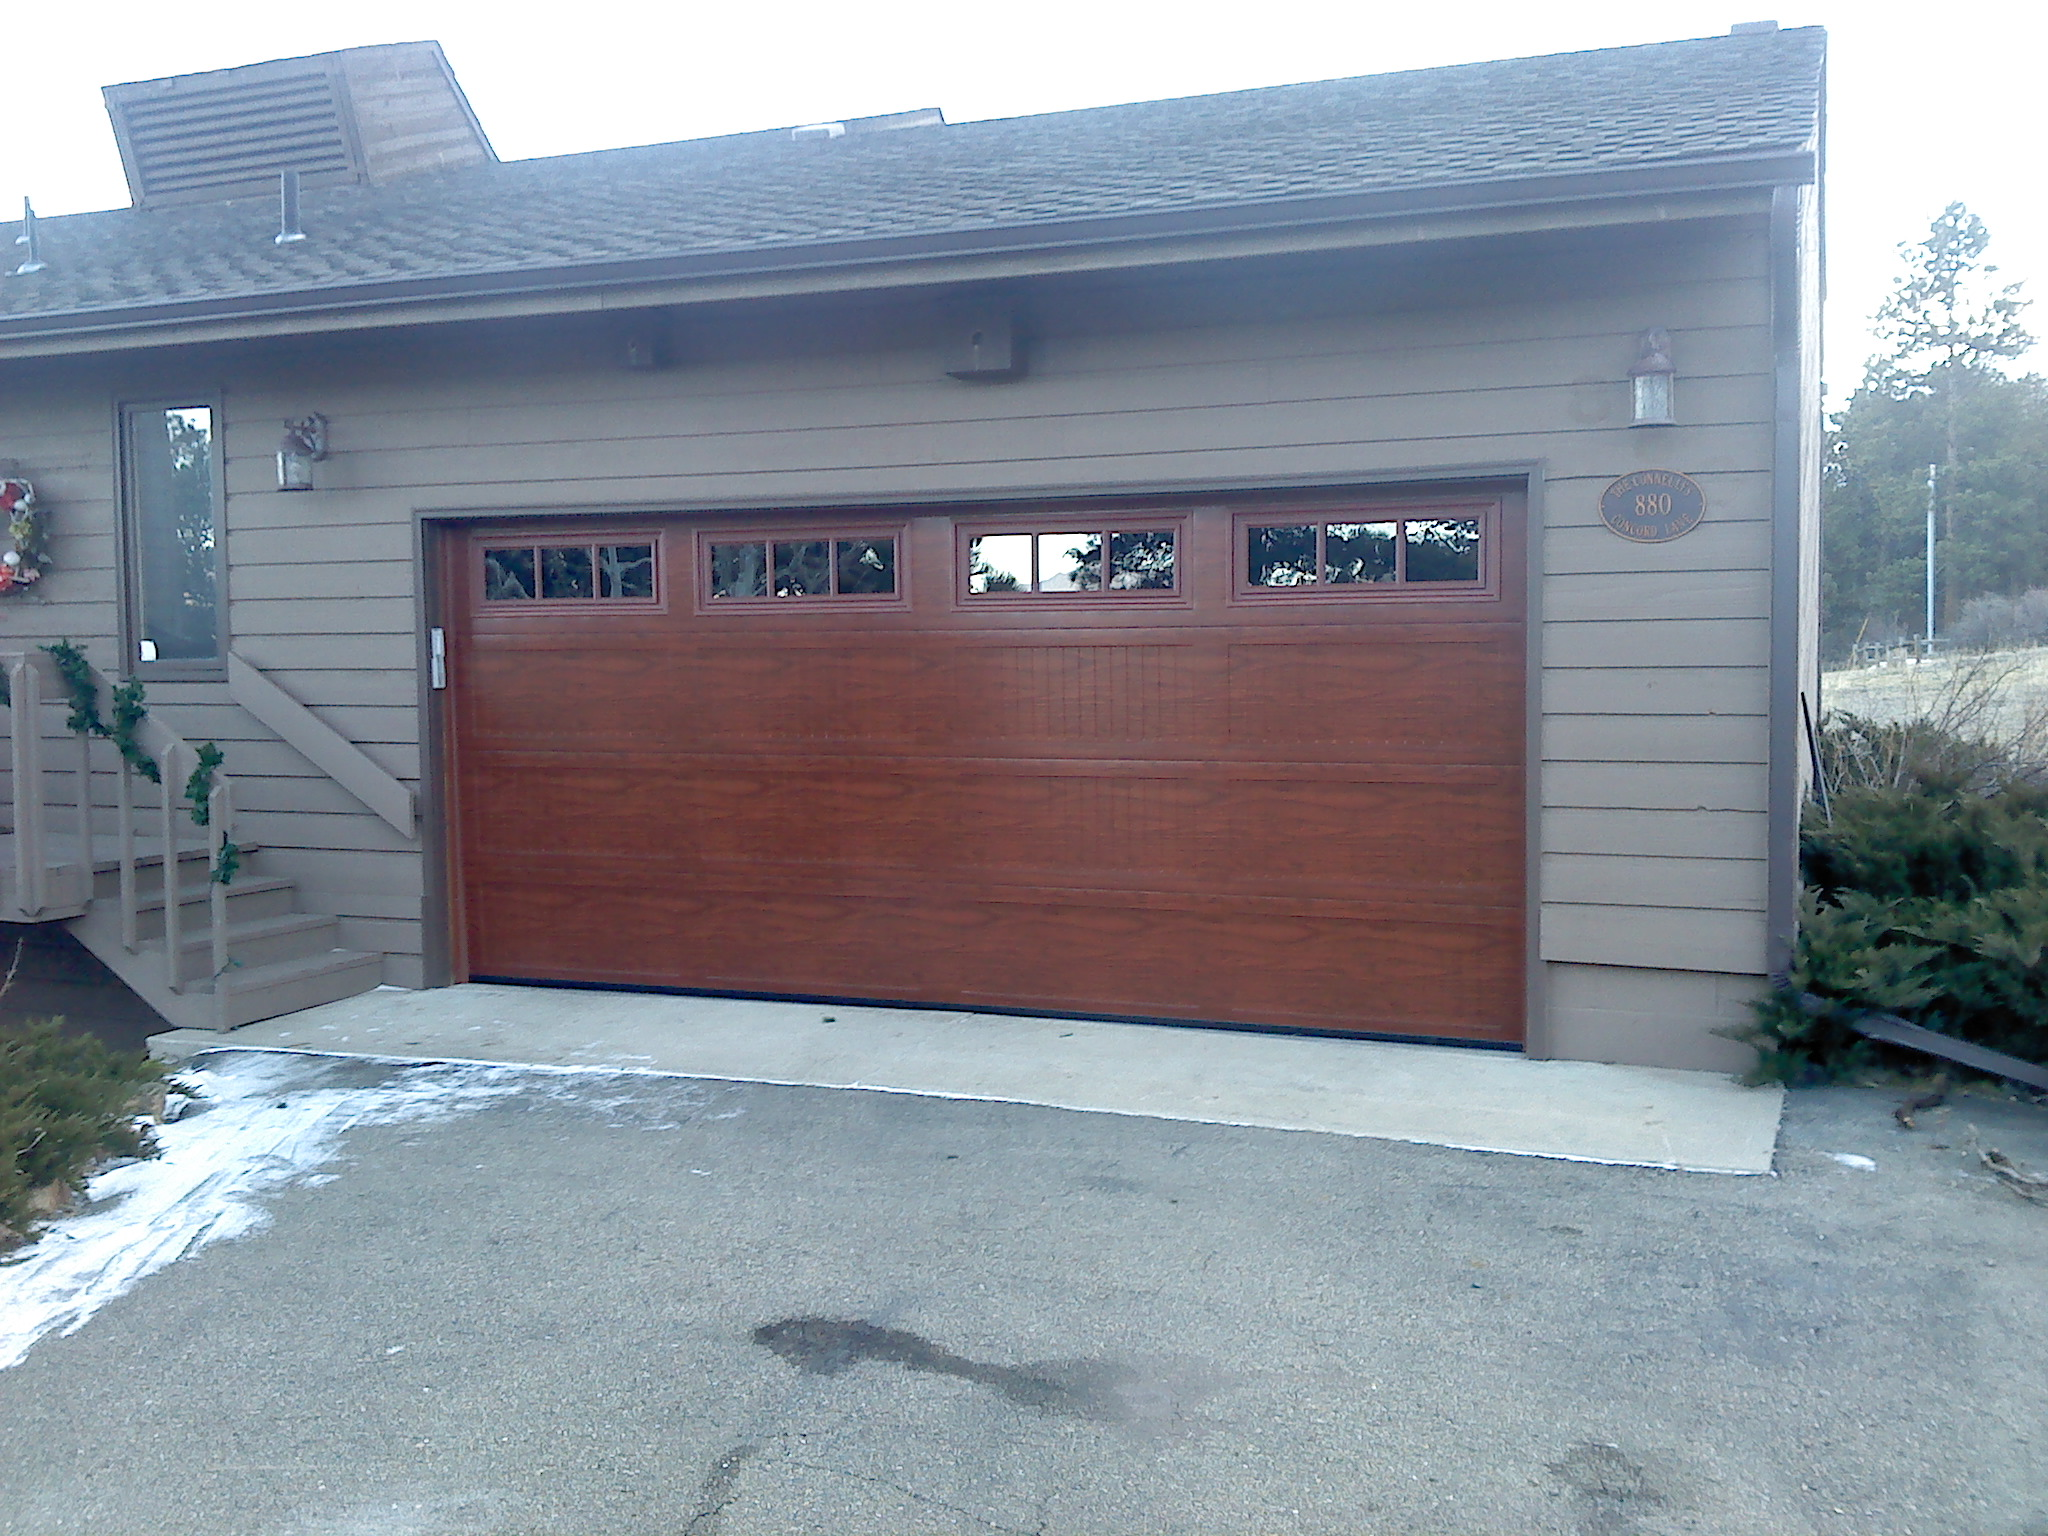 Garage doors in lakewood colorado united states for Garage door repair lakewood